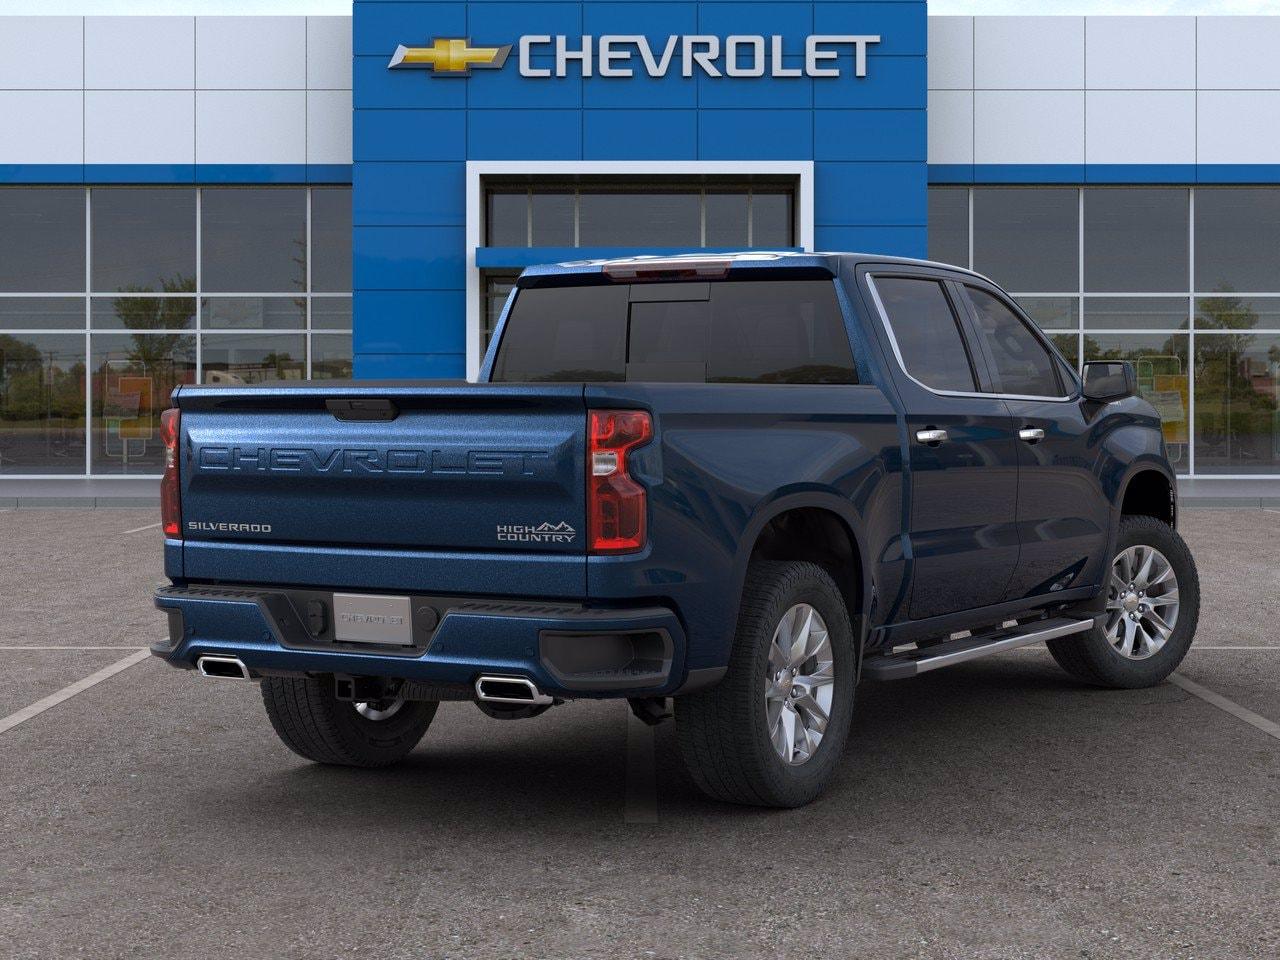 2020 Chevrolet Silverado 1500 Crew Cab 4x4, Pickup #C201648 - photo 2